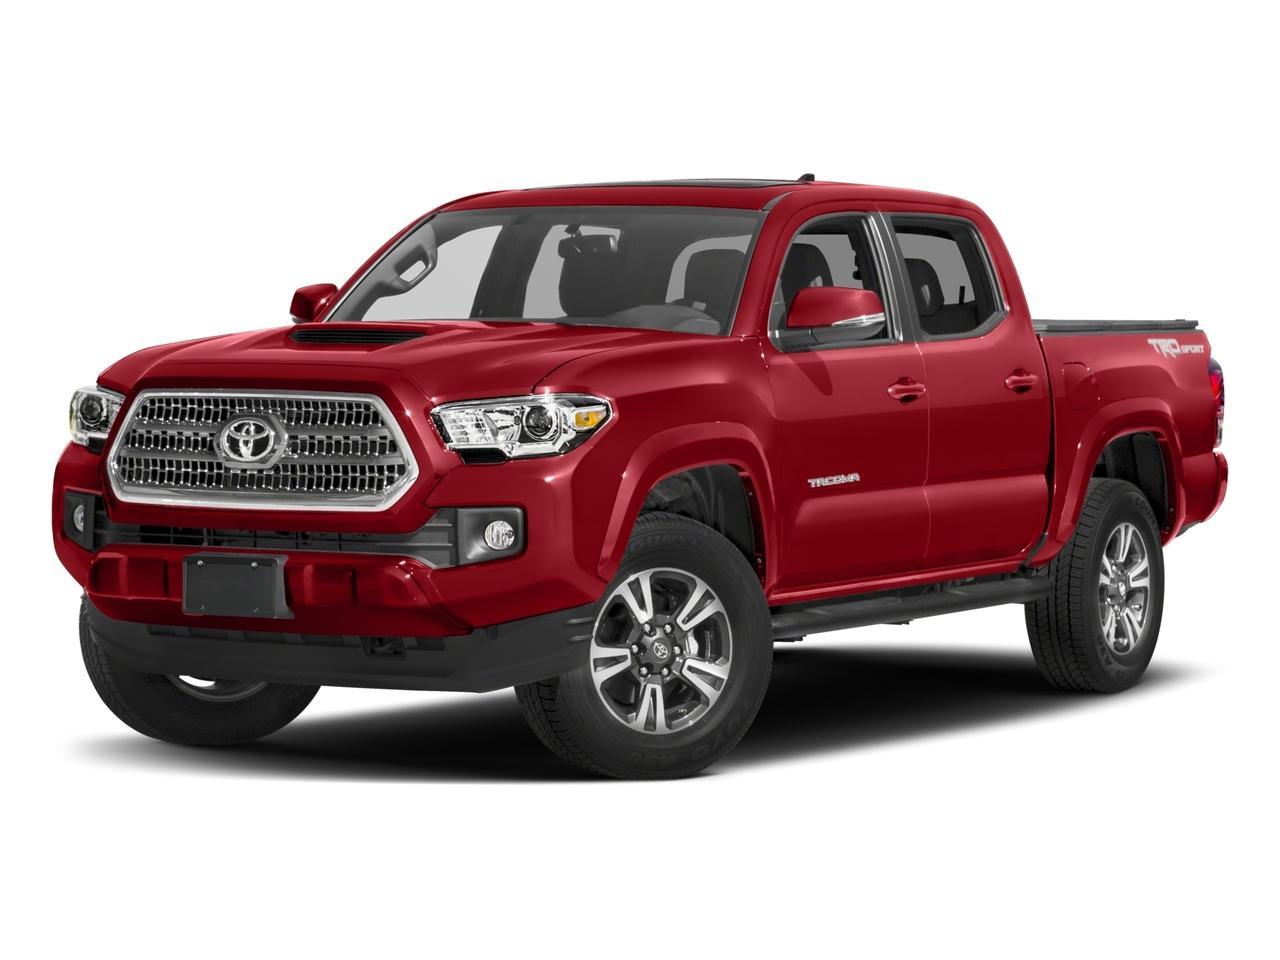 2017 Toyota Tacoma Vehicle Photo in Tulsa, OK 74133